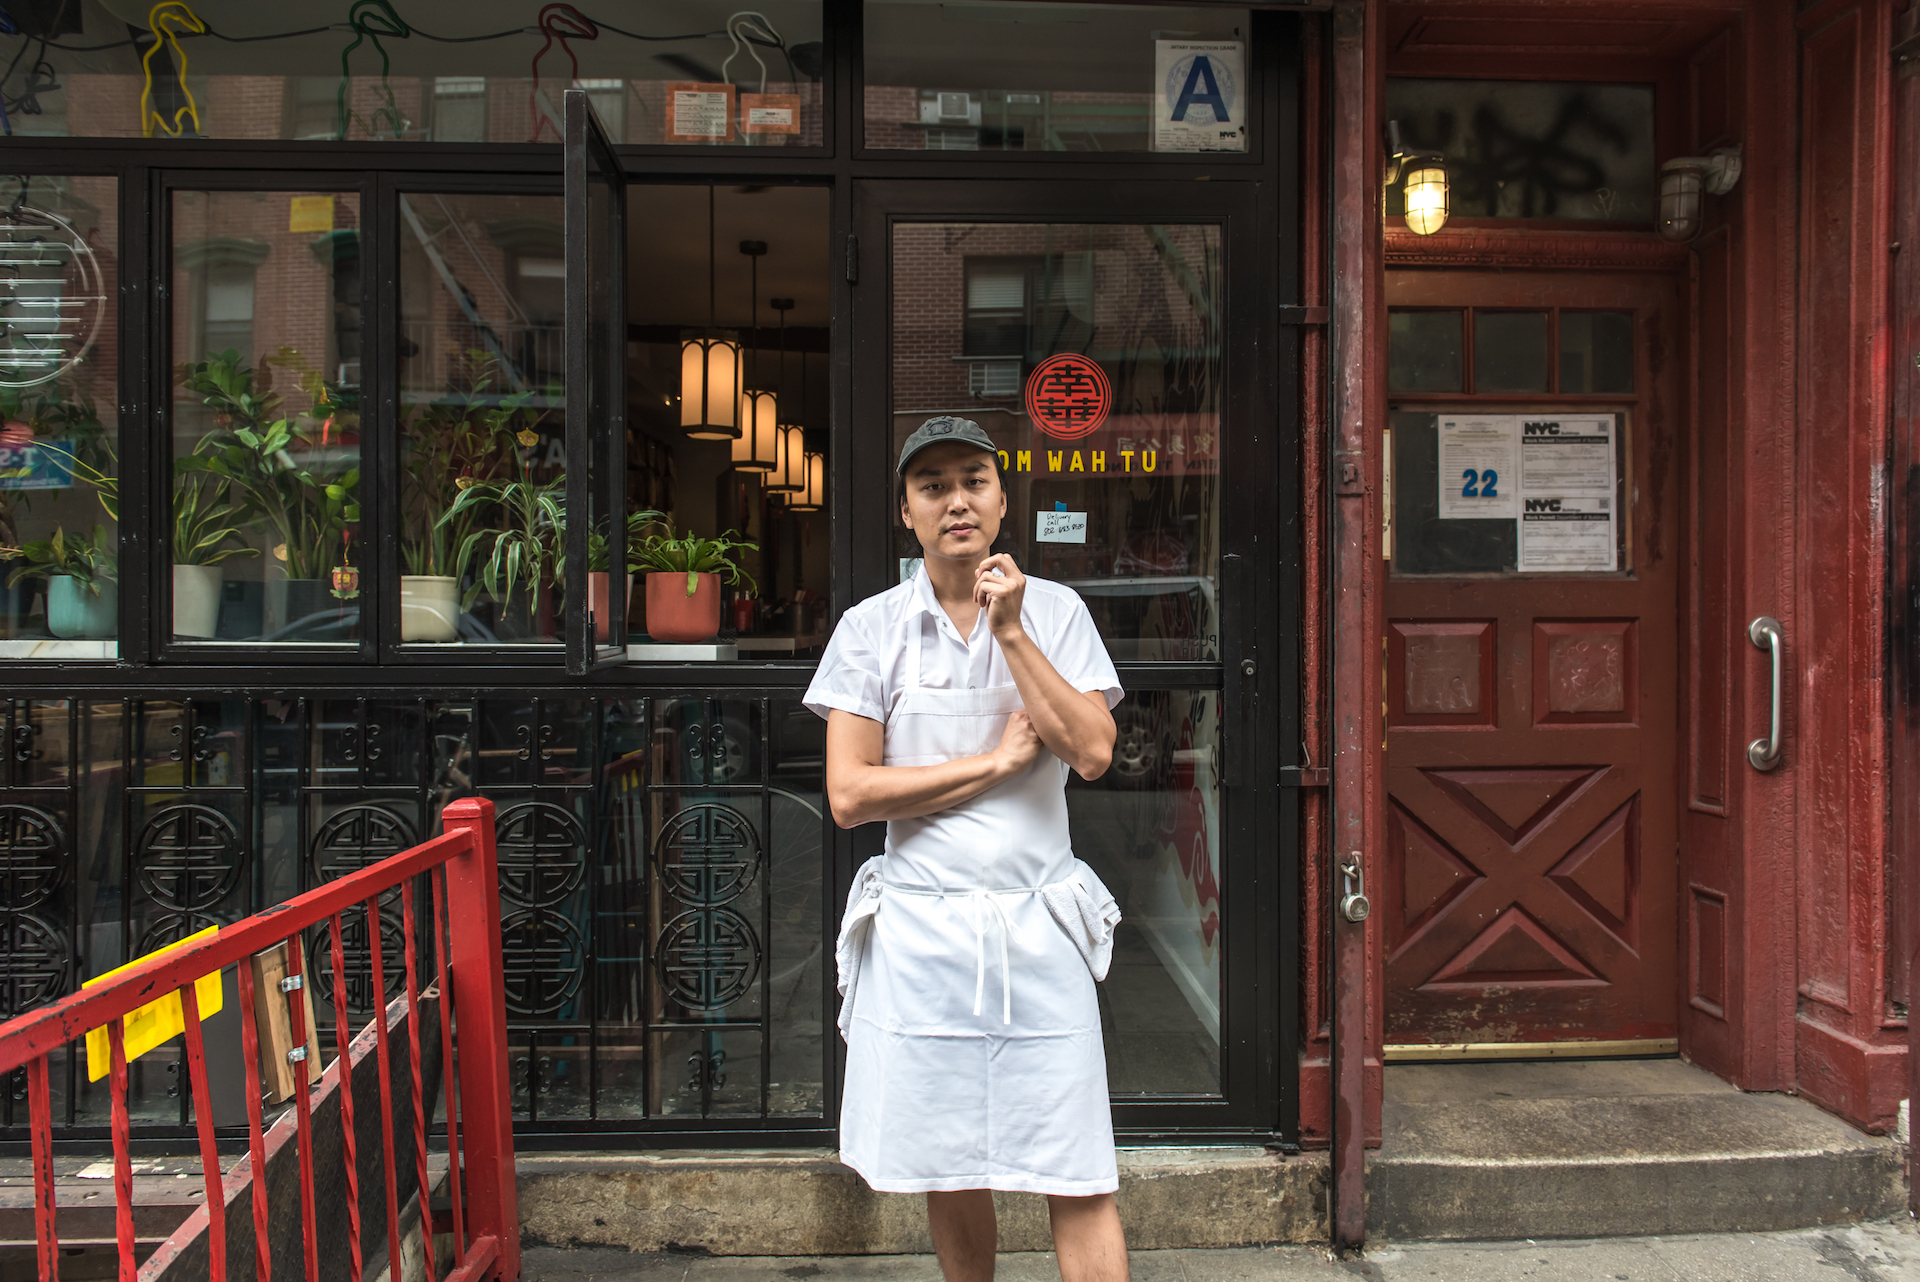 Chef Jonathan Wu, the creative food genius living inside Nom Wah Tu, an amalgamation of the Nom Wah Food Group and Fung Tu.